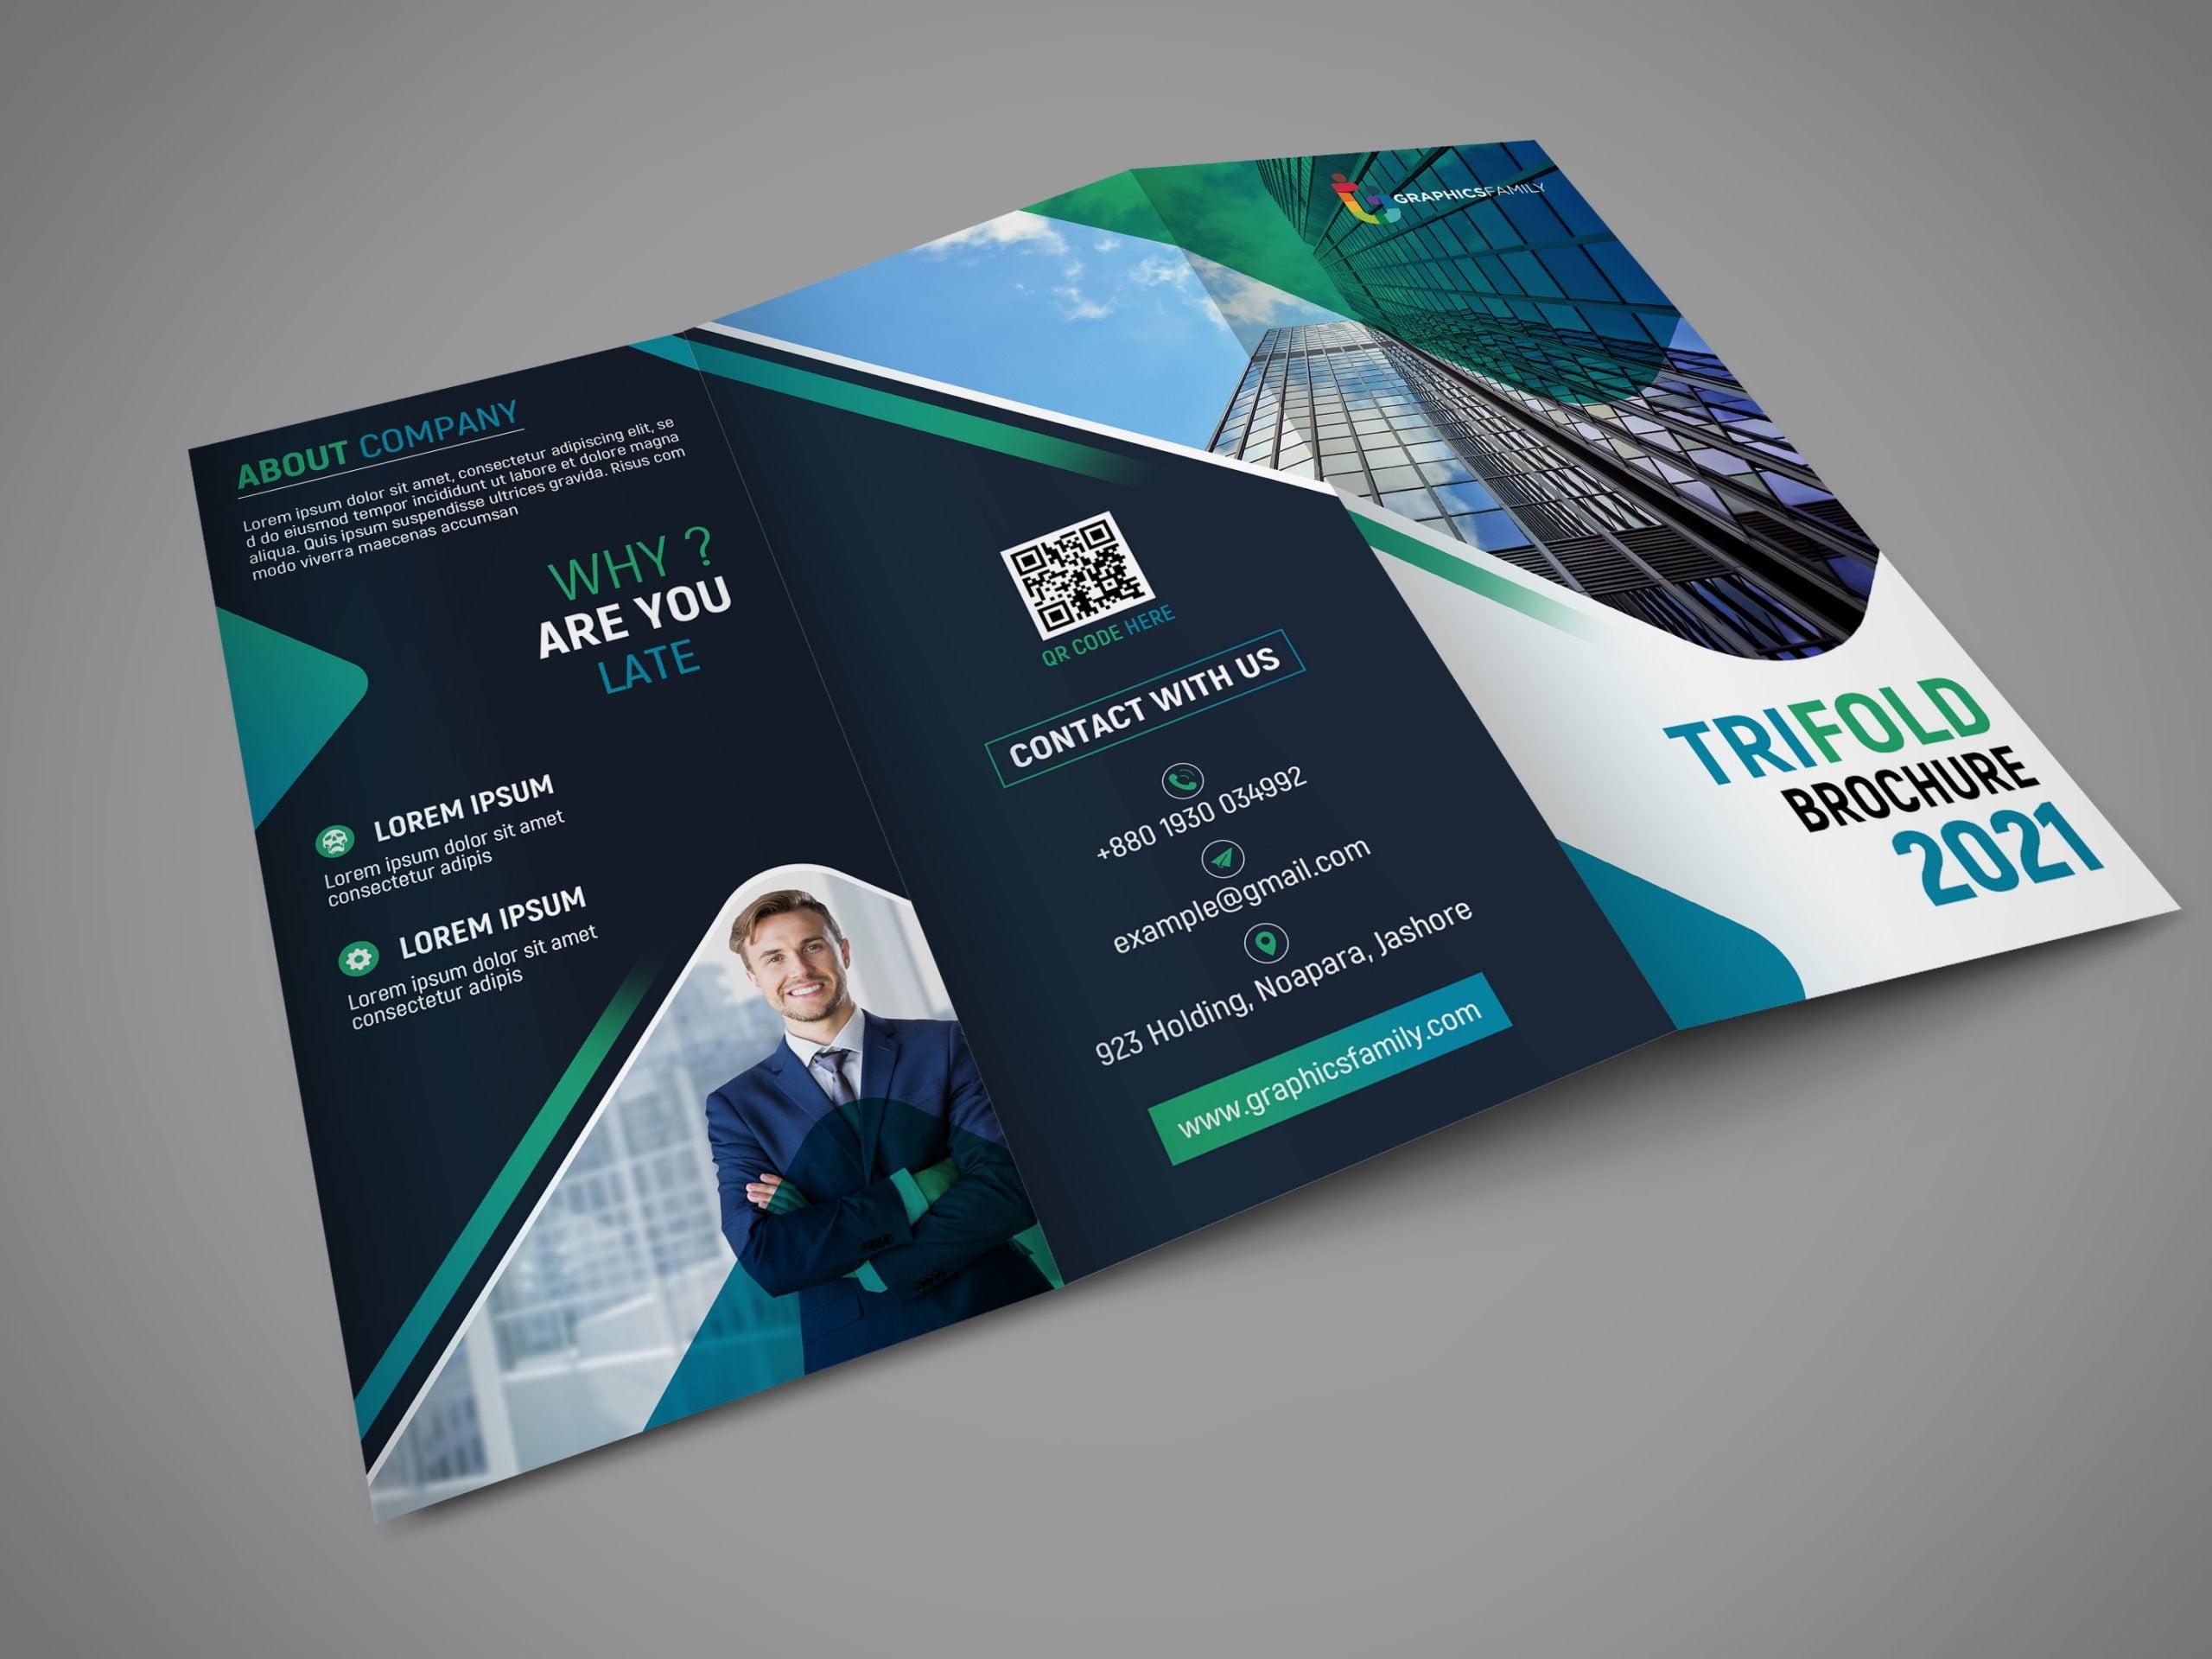 Free Editable Company Trifold Brochure Design Template